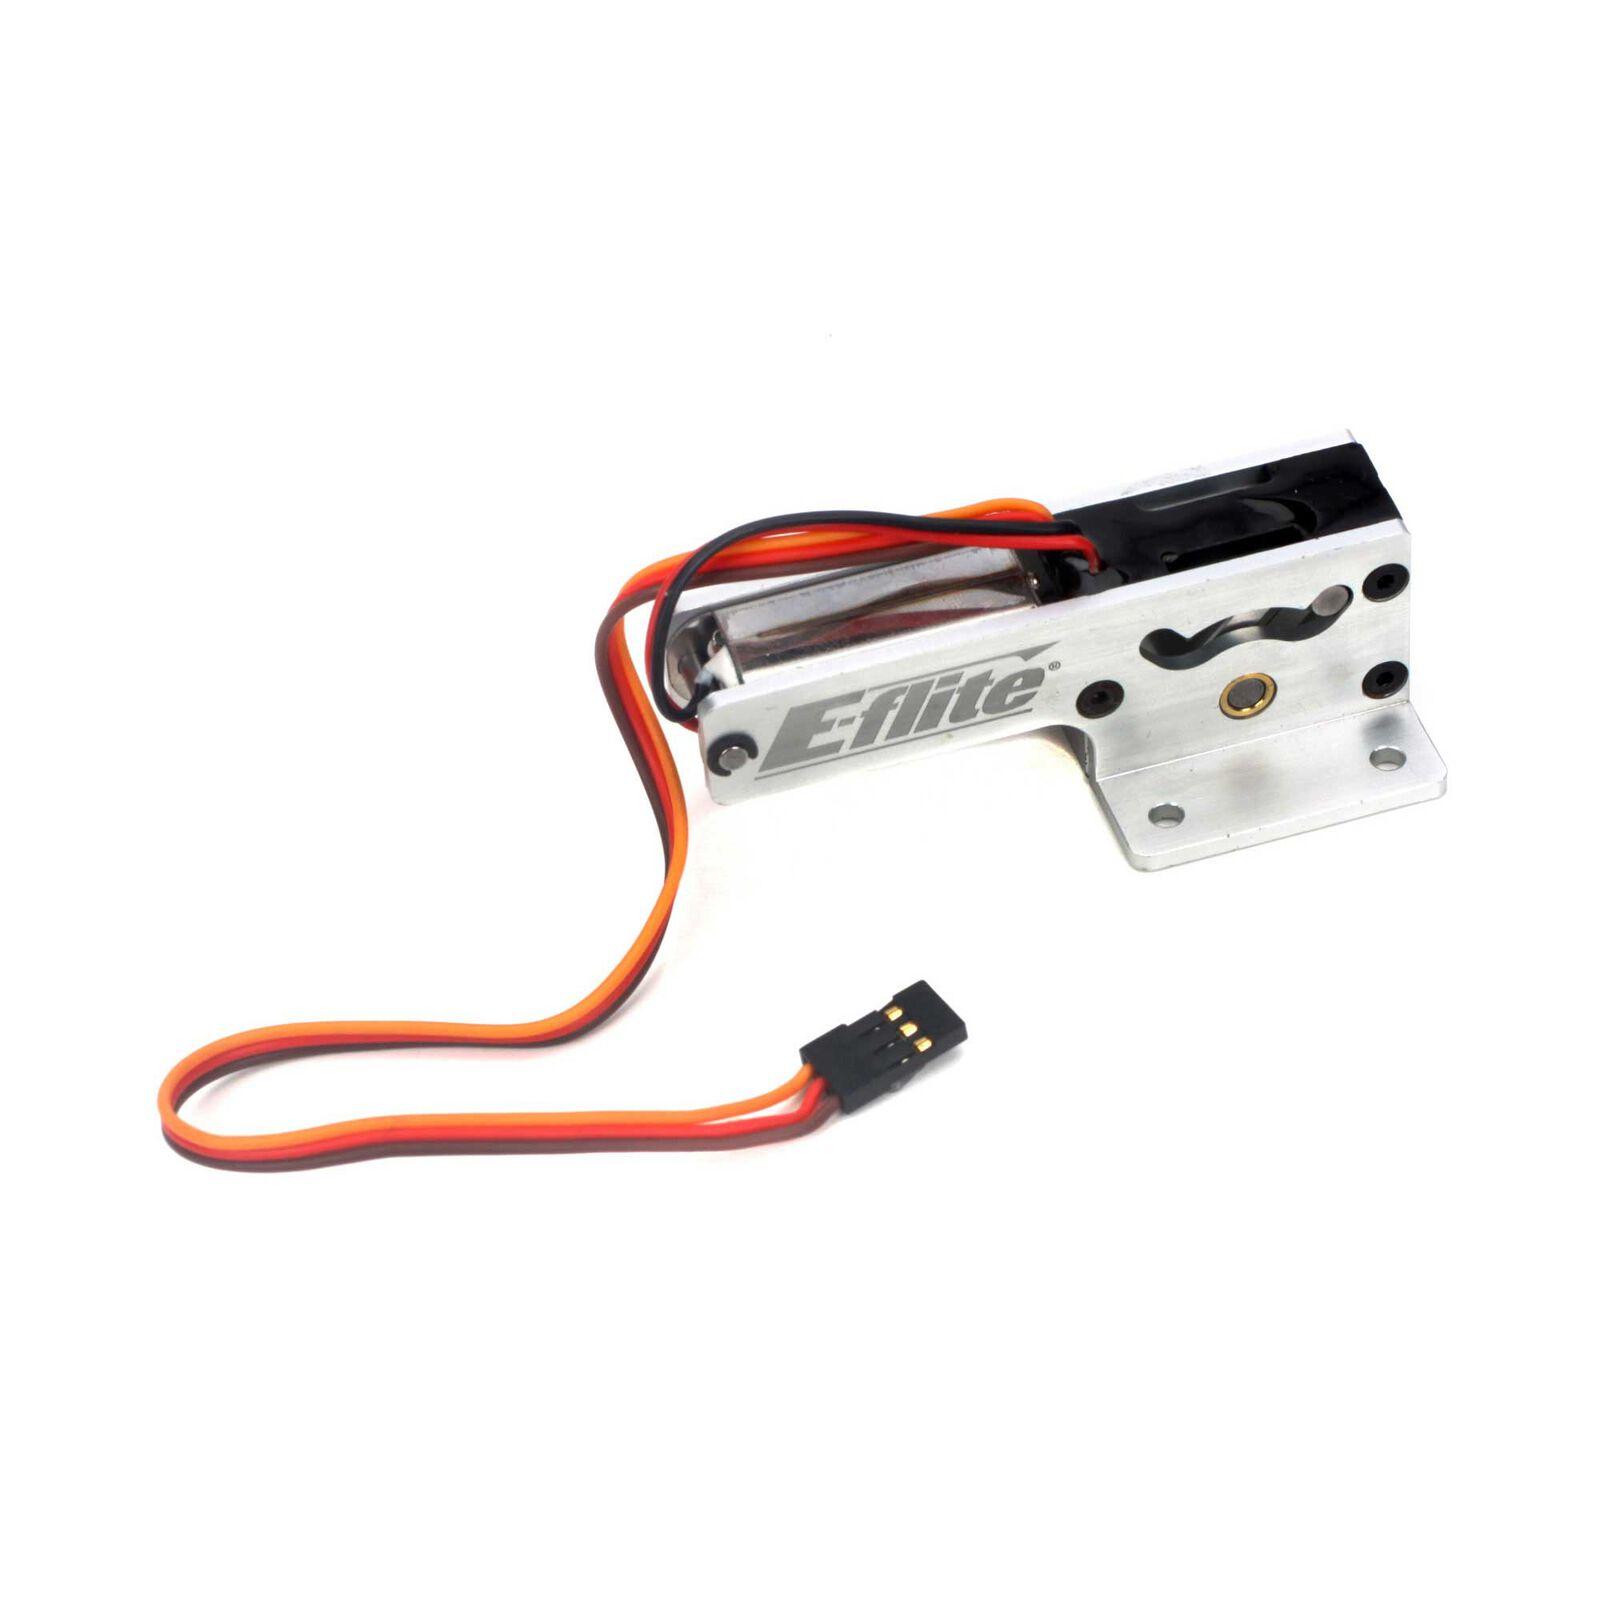 25 - 46 85-Degree Main Electric Retract Unit